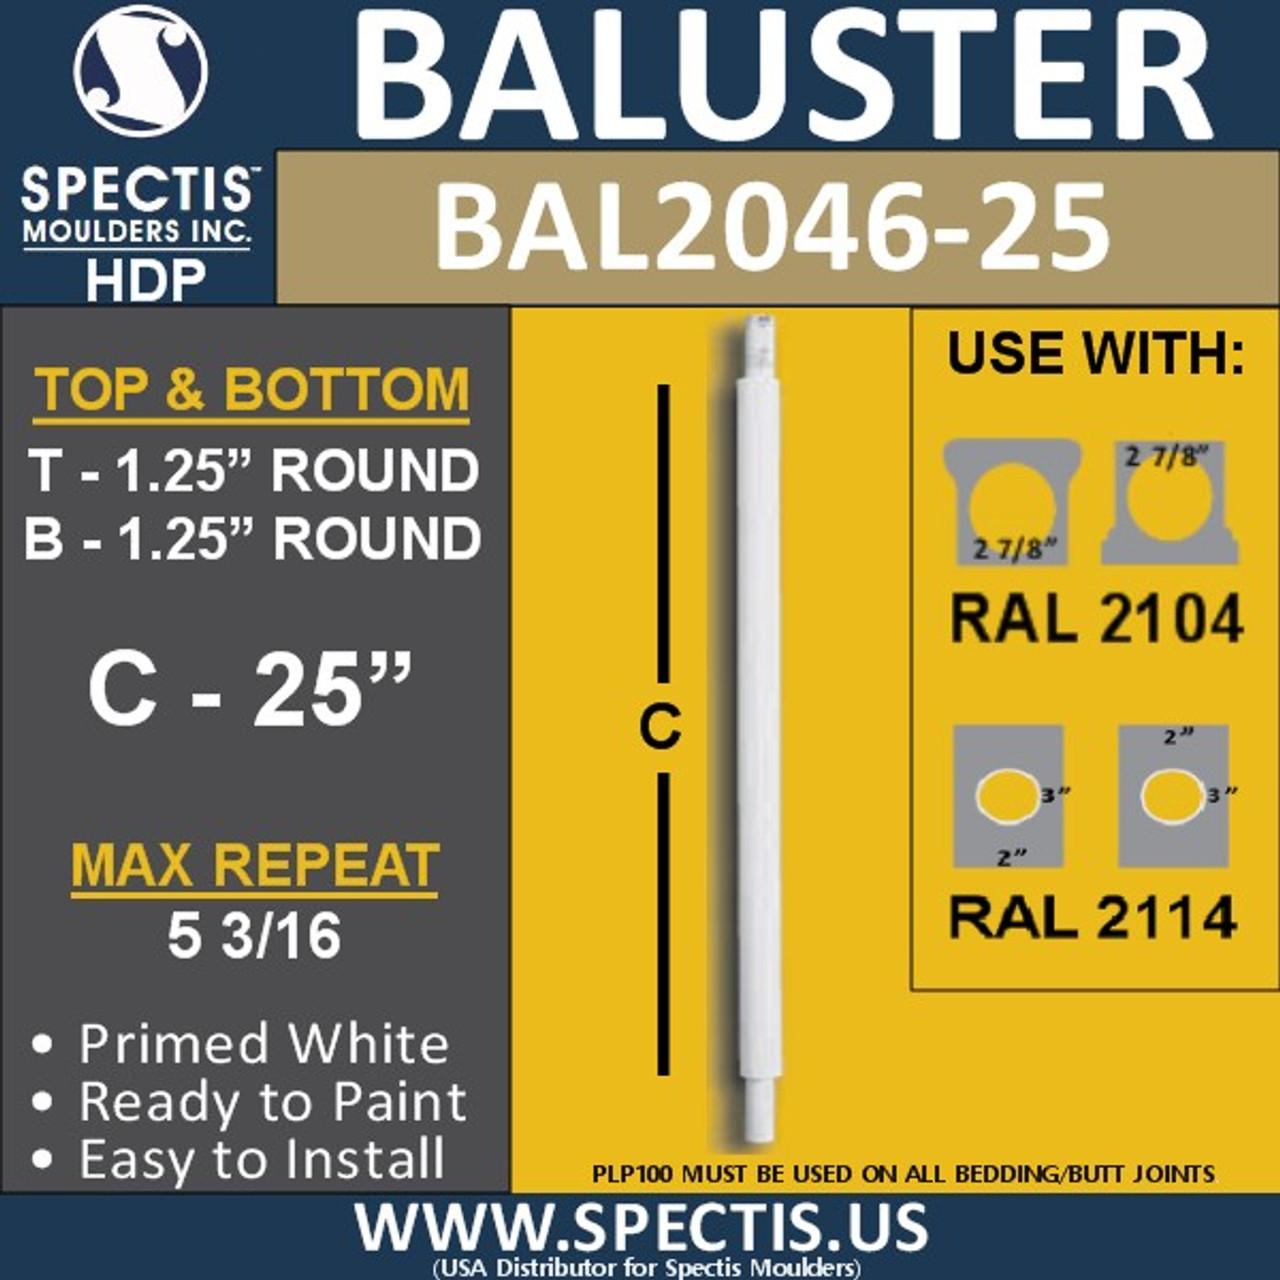 "BAL2046-25 Spectis Urethane Round Baluster 1 1/4"" x 25"""